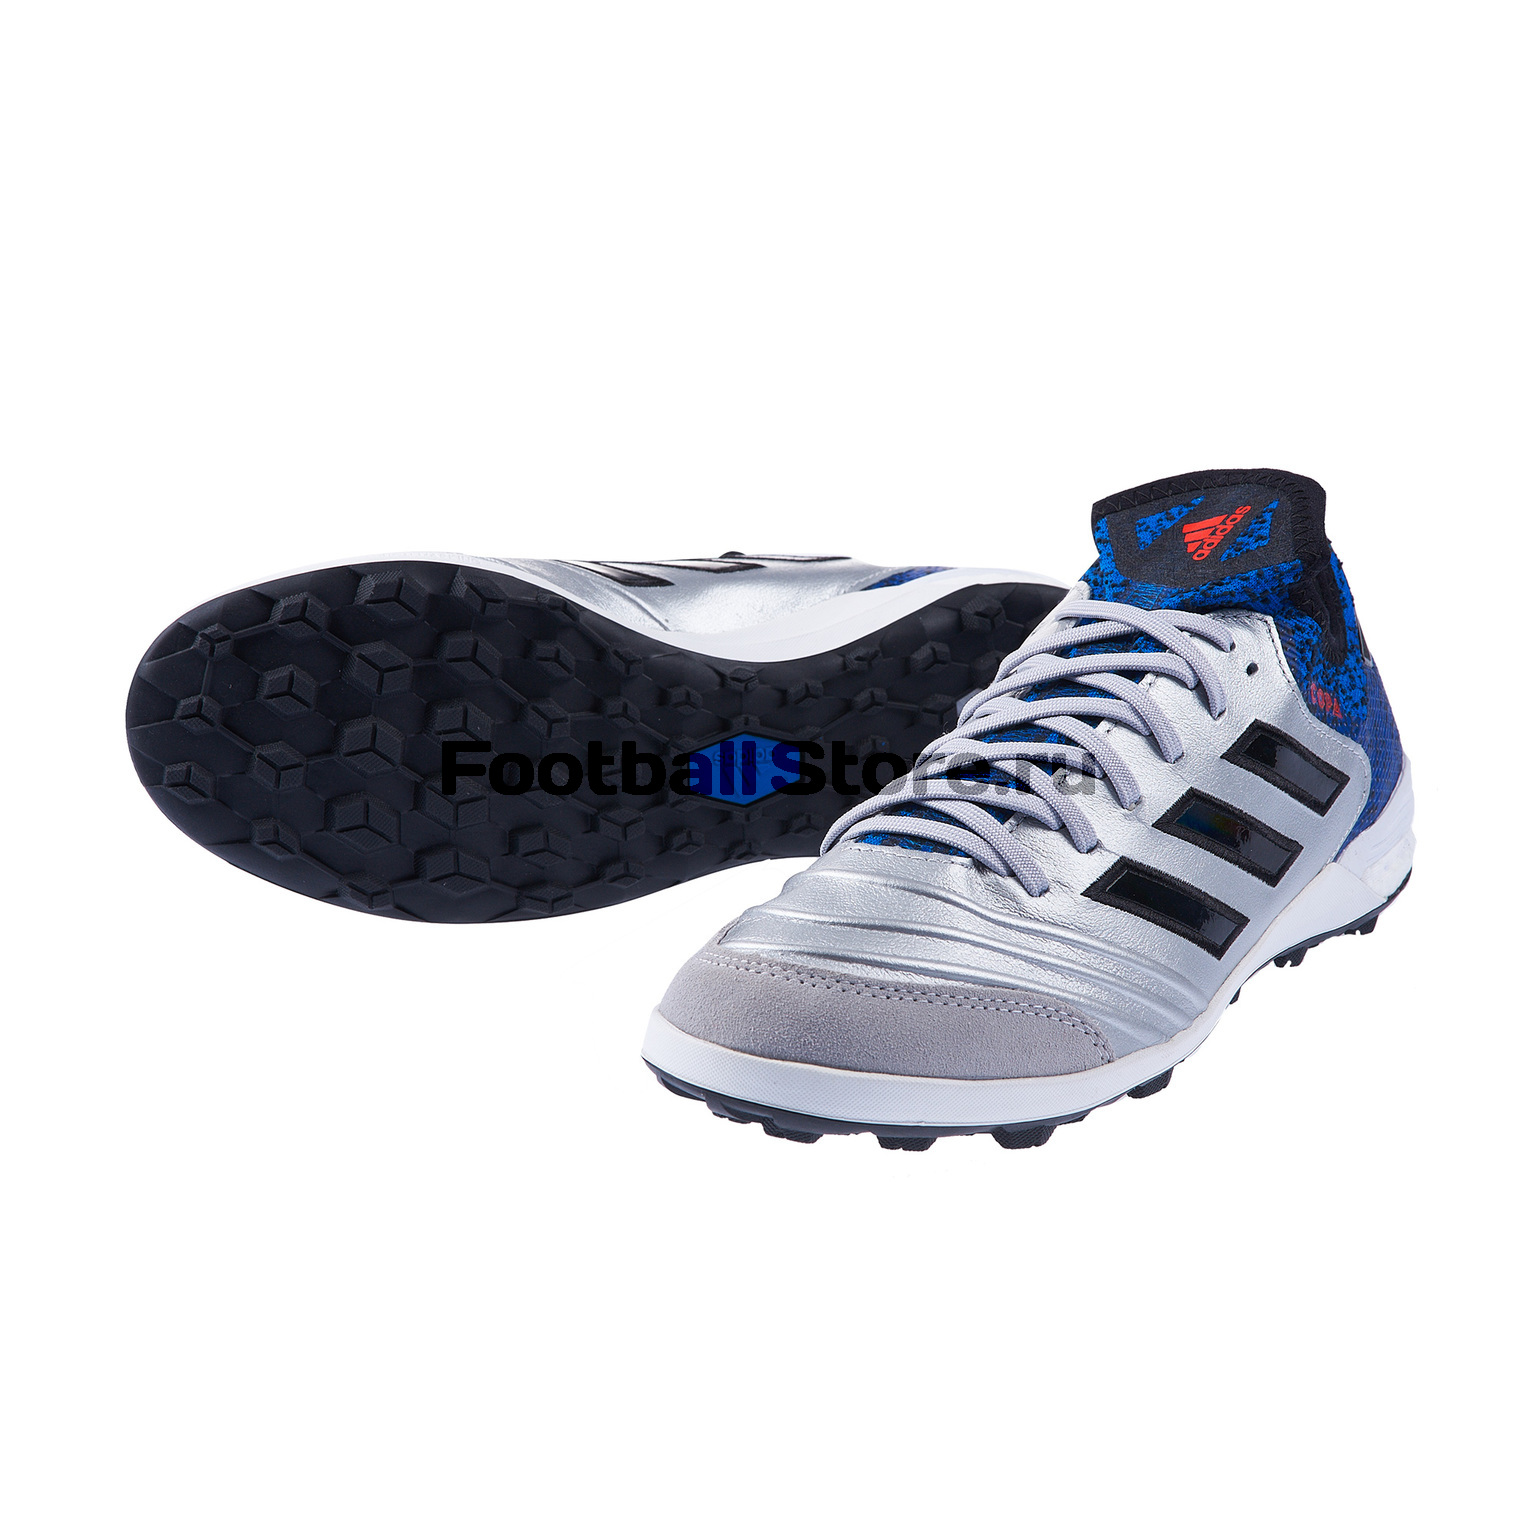 Шиповки Adidas Copa Tango 18.1 TF DB2202 цена